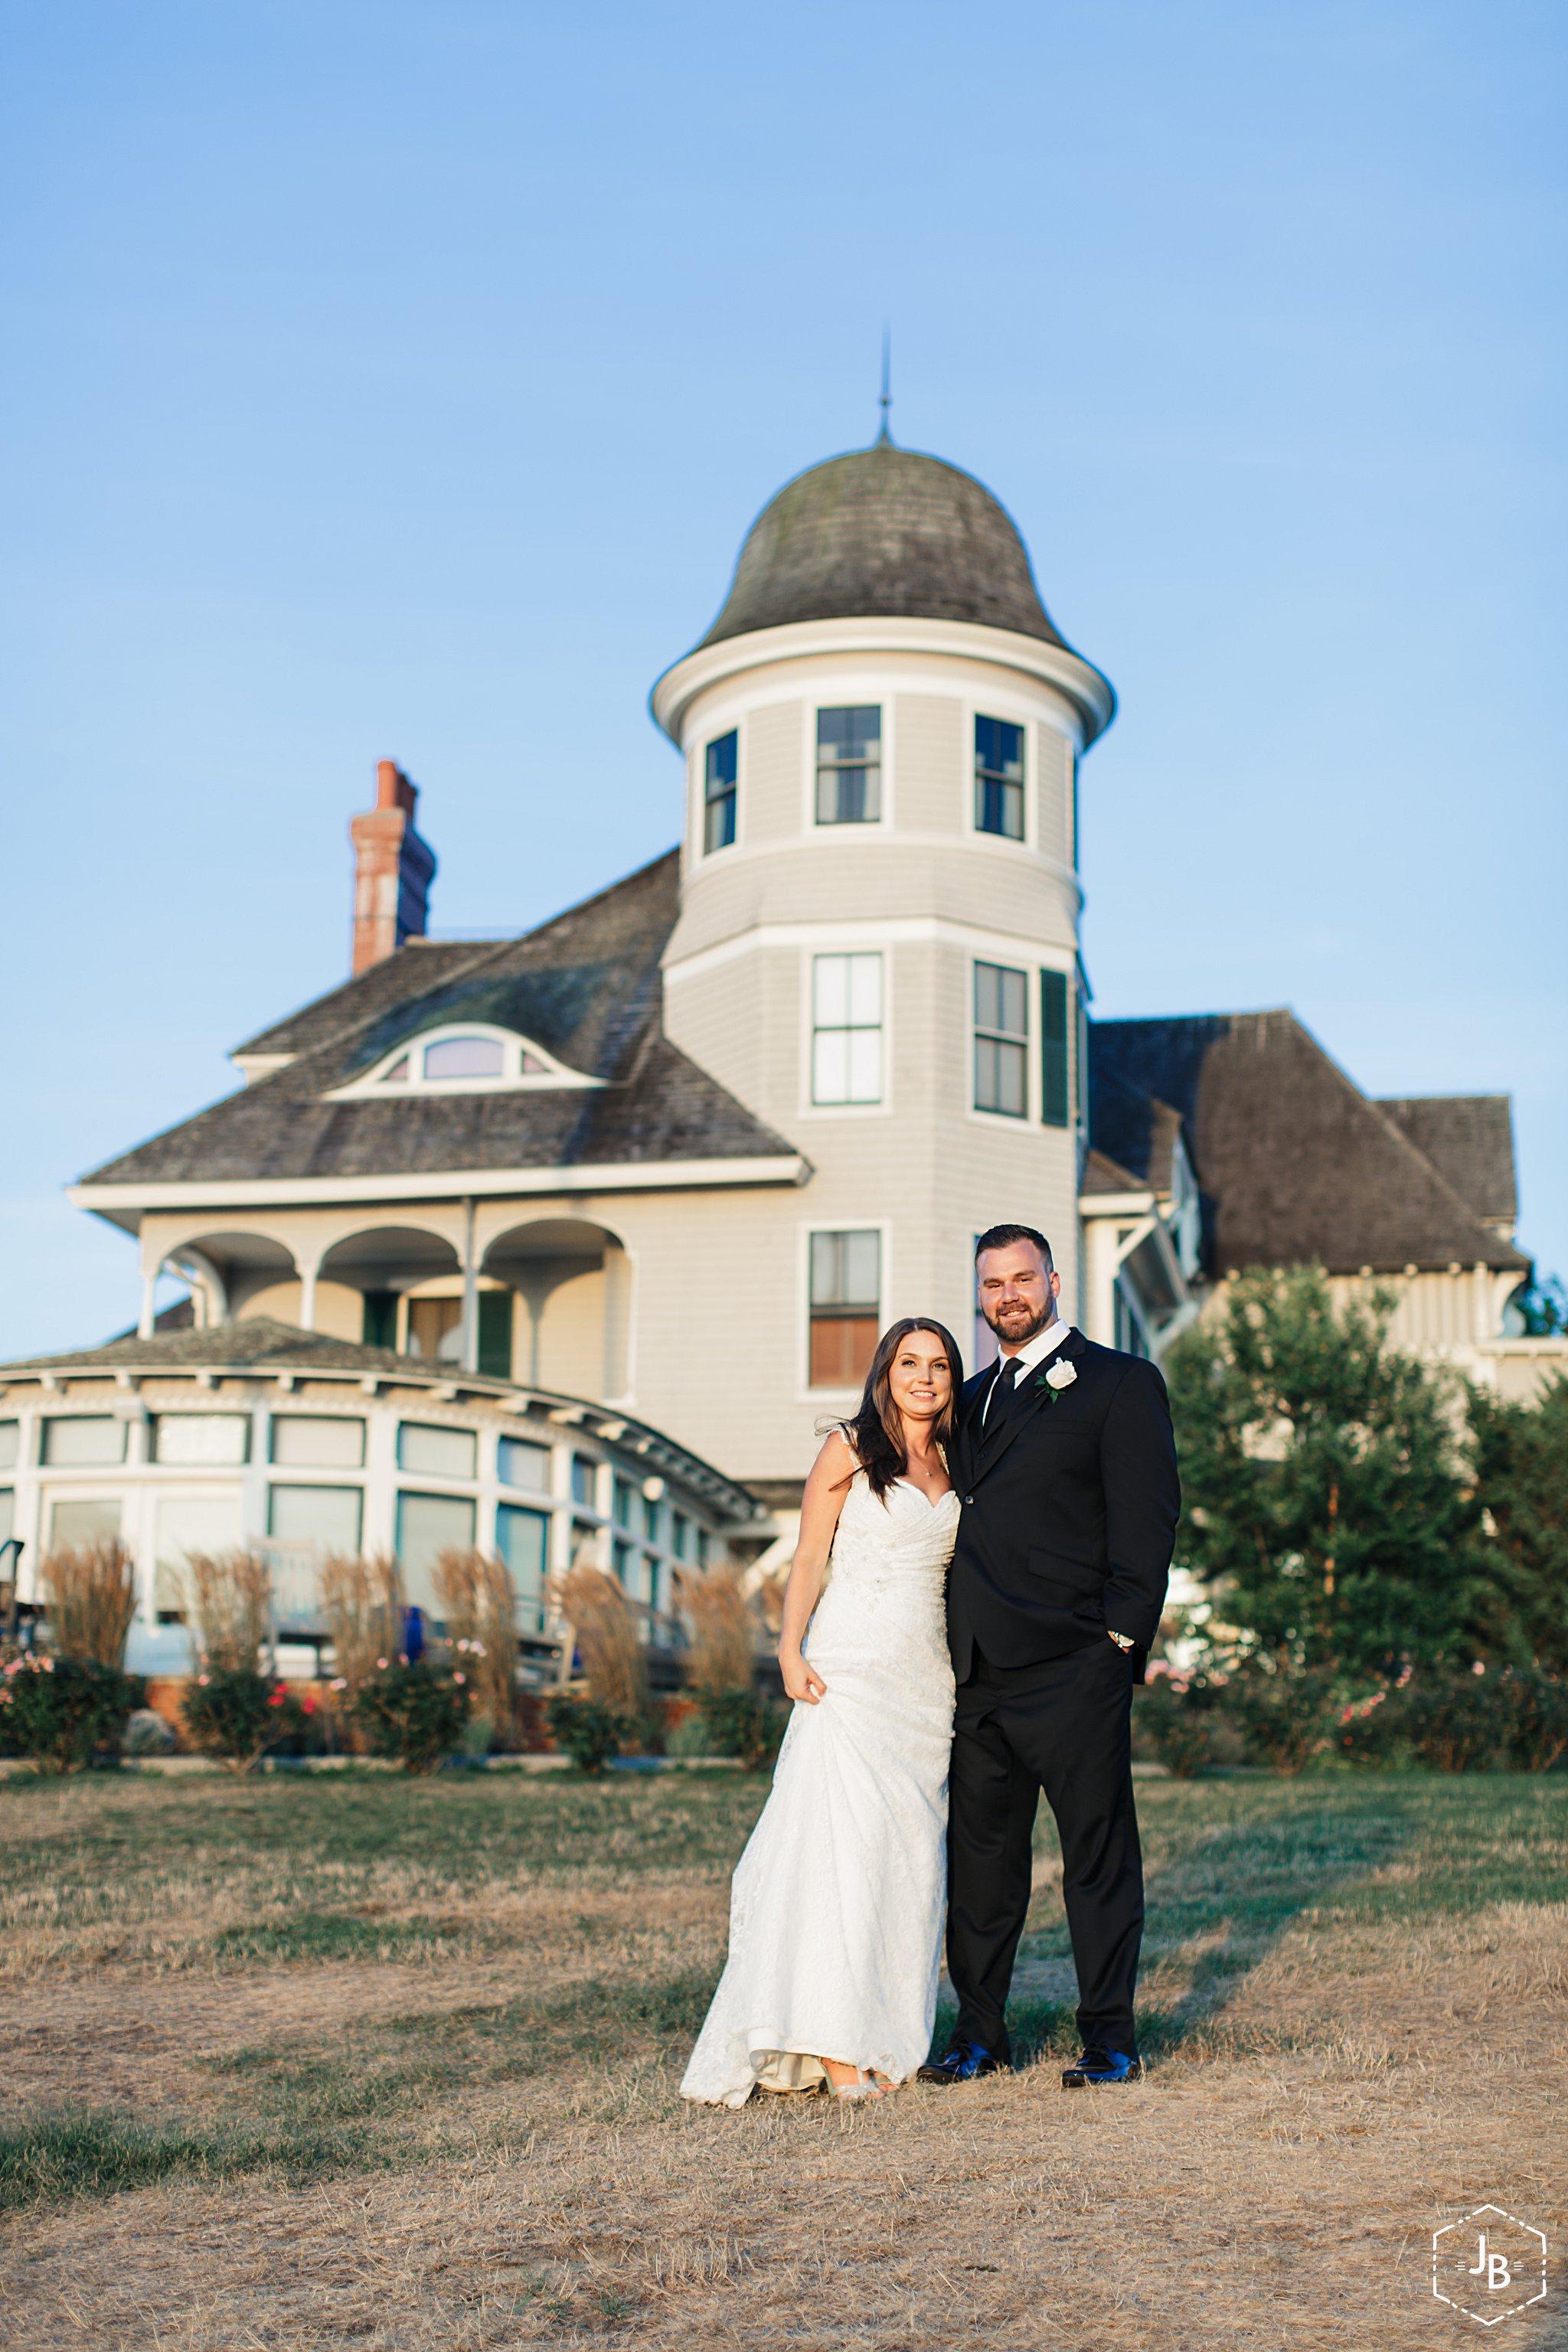 WeddingandEngagementFloridaPhotographer_2943.jpg